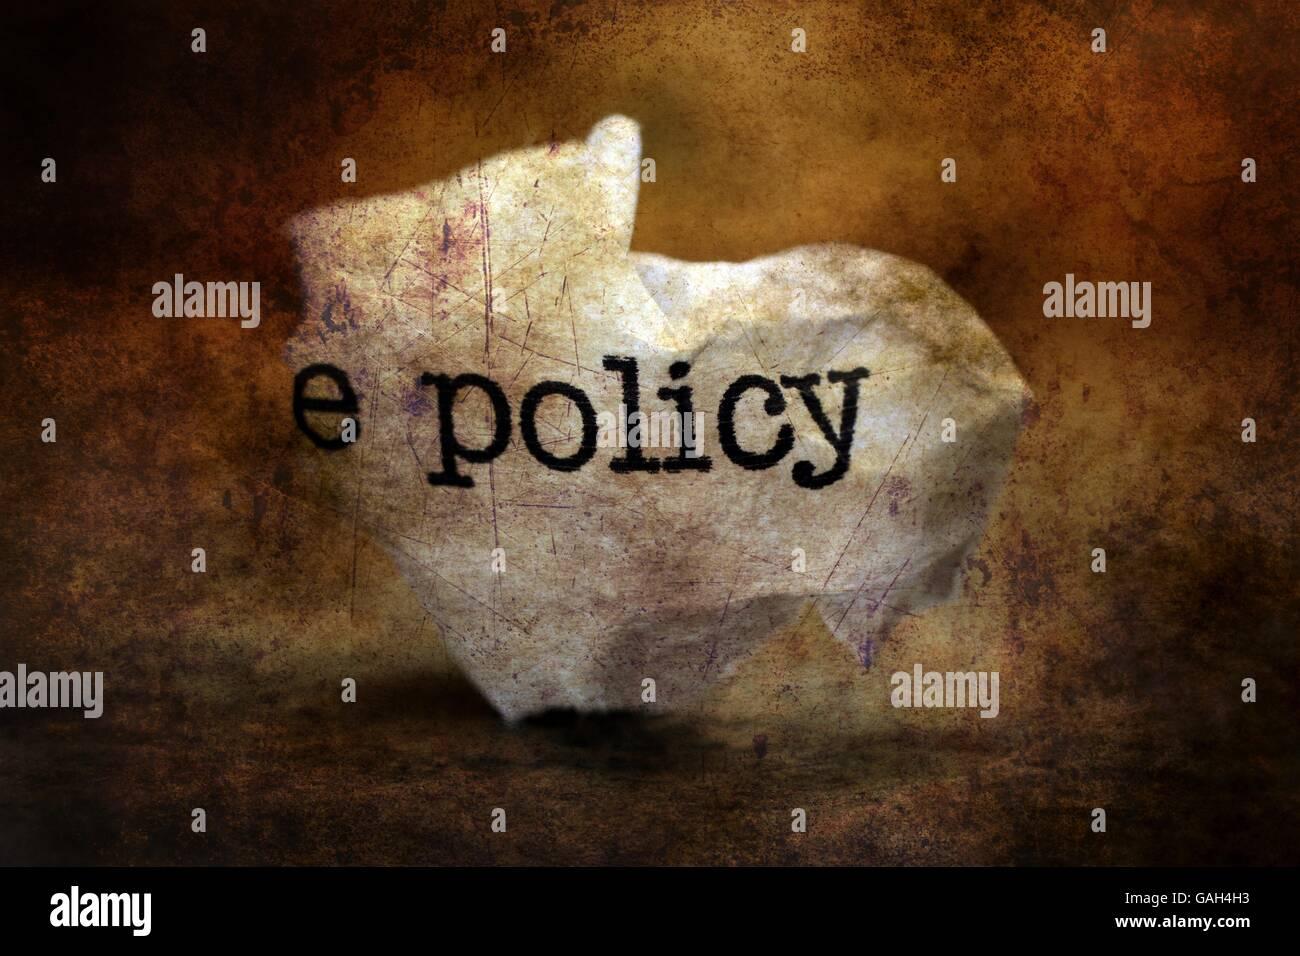 Policy trashgrunge  concept Stock Photo